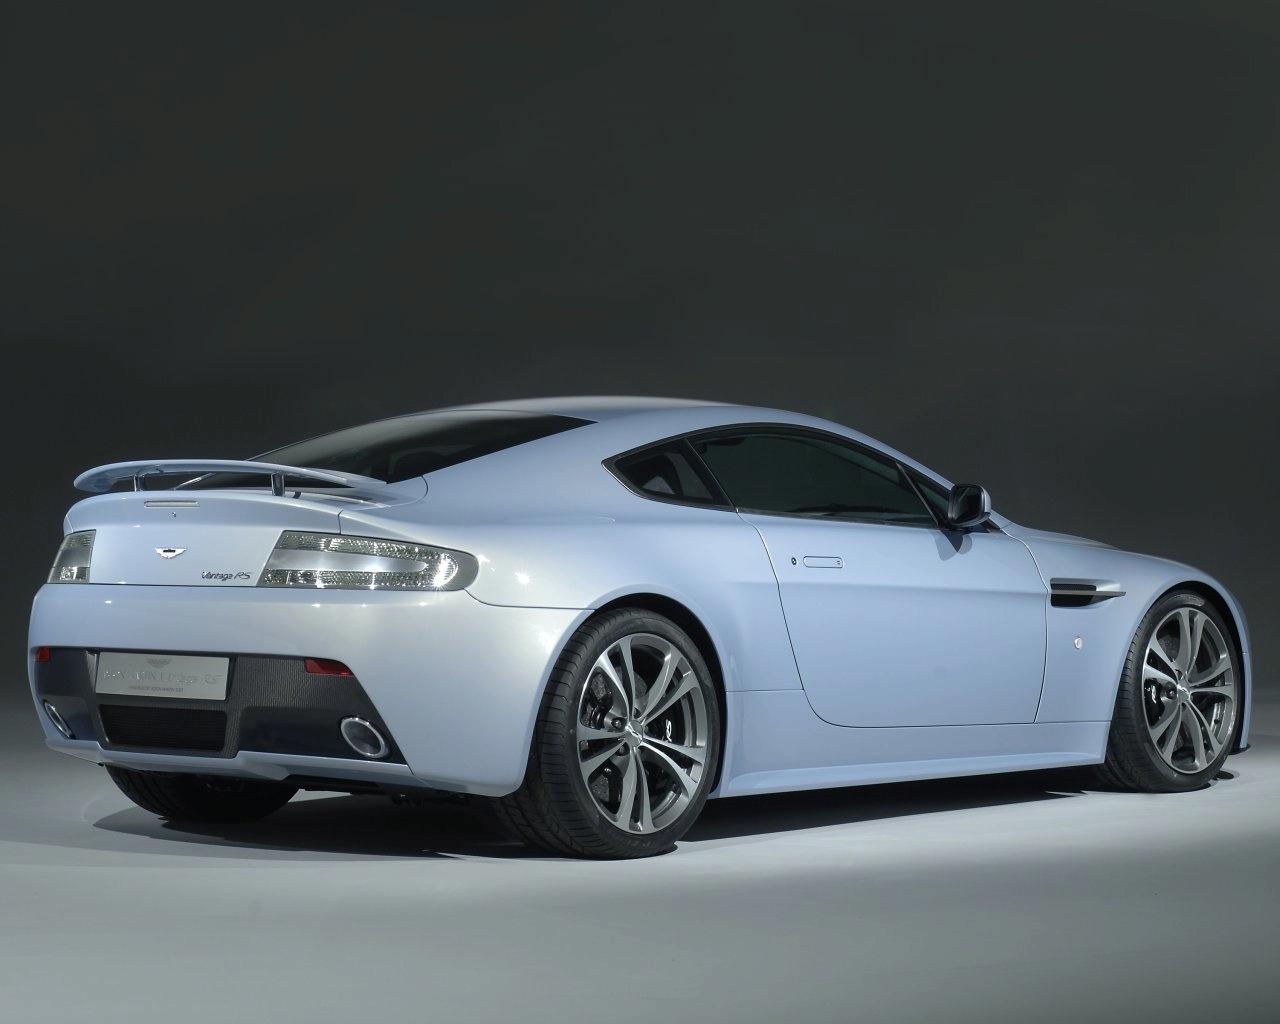 http://images.caradisiac.com/images/1/2/8/4/21284/S0-Aston-Martin-V12-Vantage-RS-Concept-la-future-bombe-anglaise-est-officielle-91405.jpg